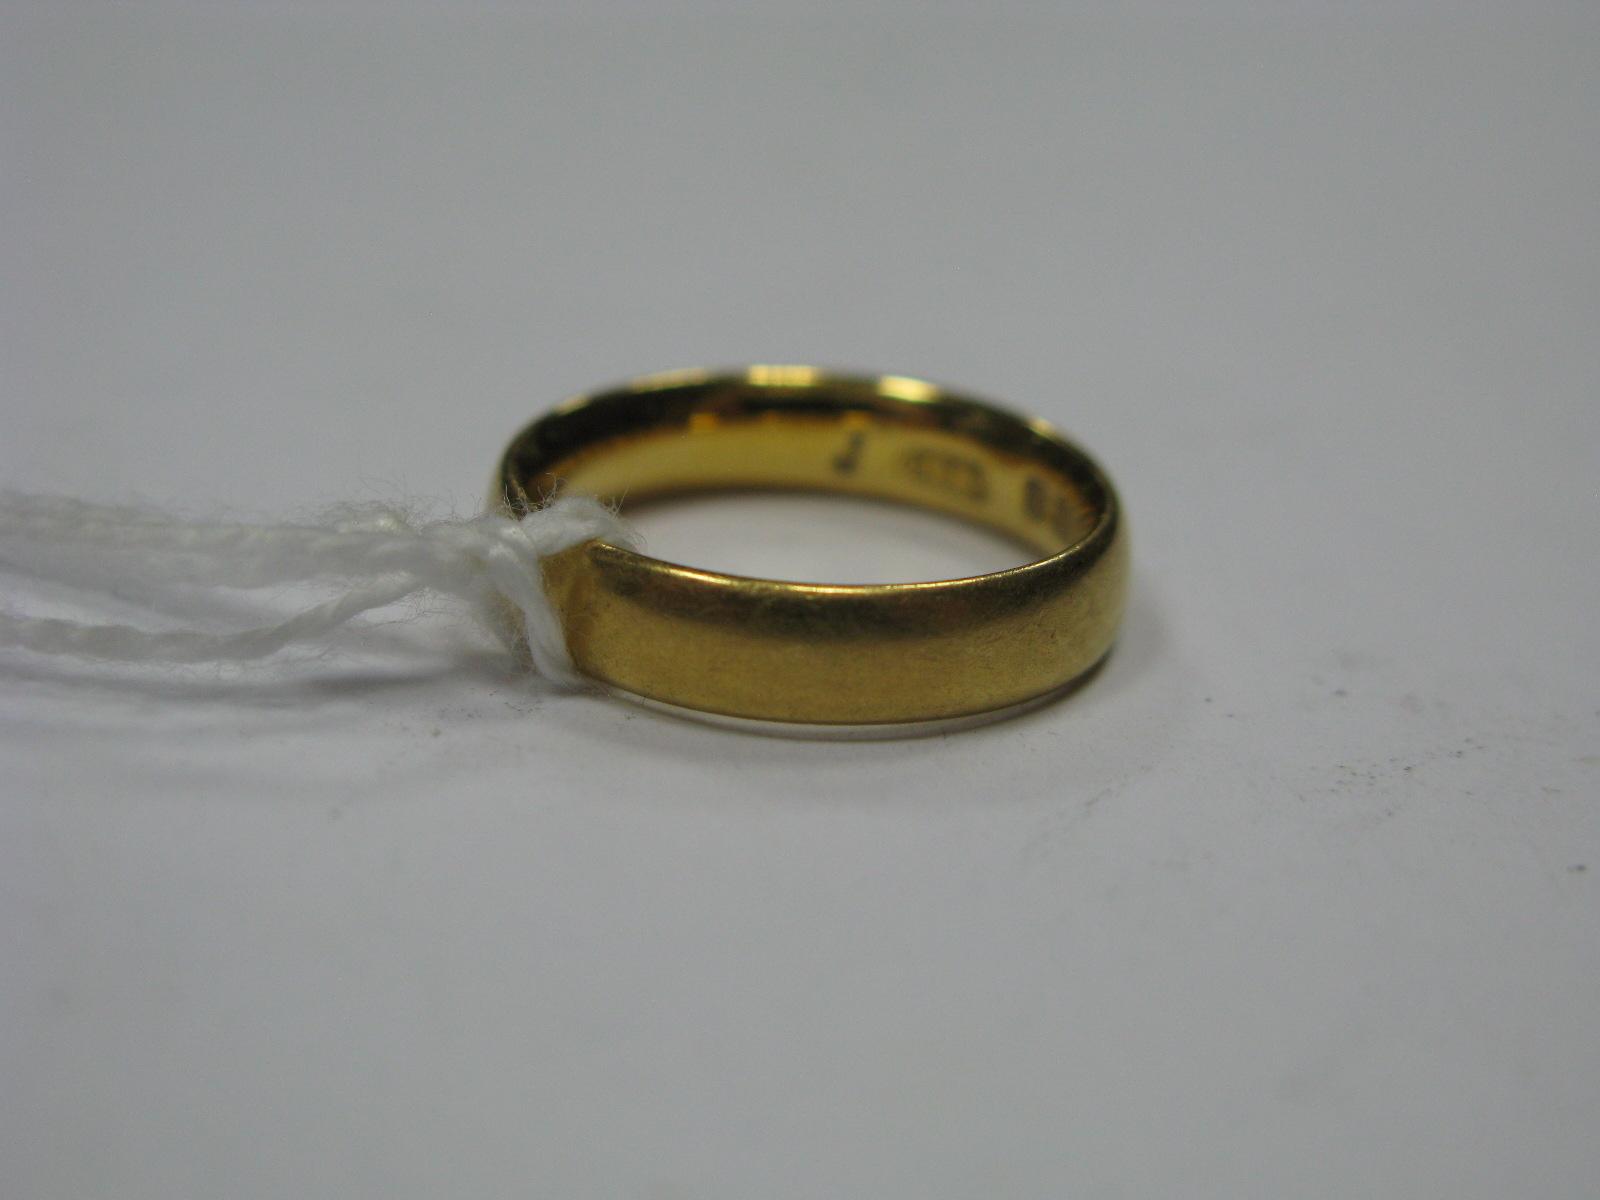 Lot 1356 - A 22ct Gold Plain Wedding Band.